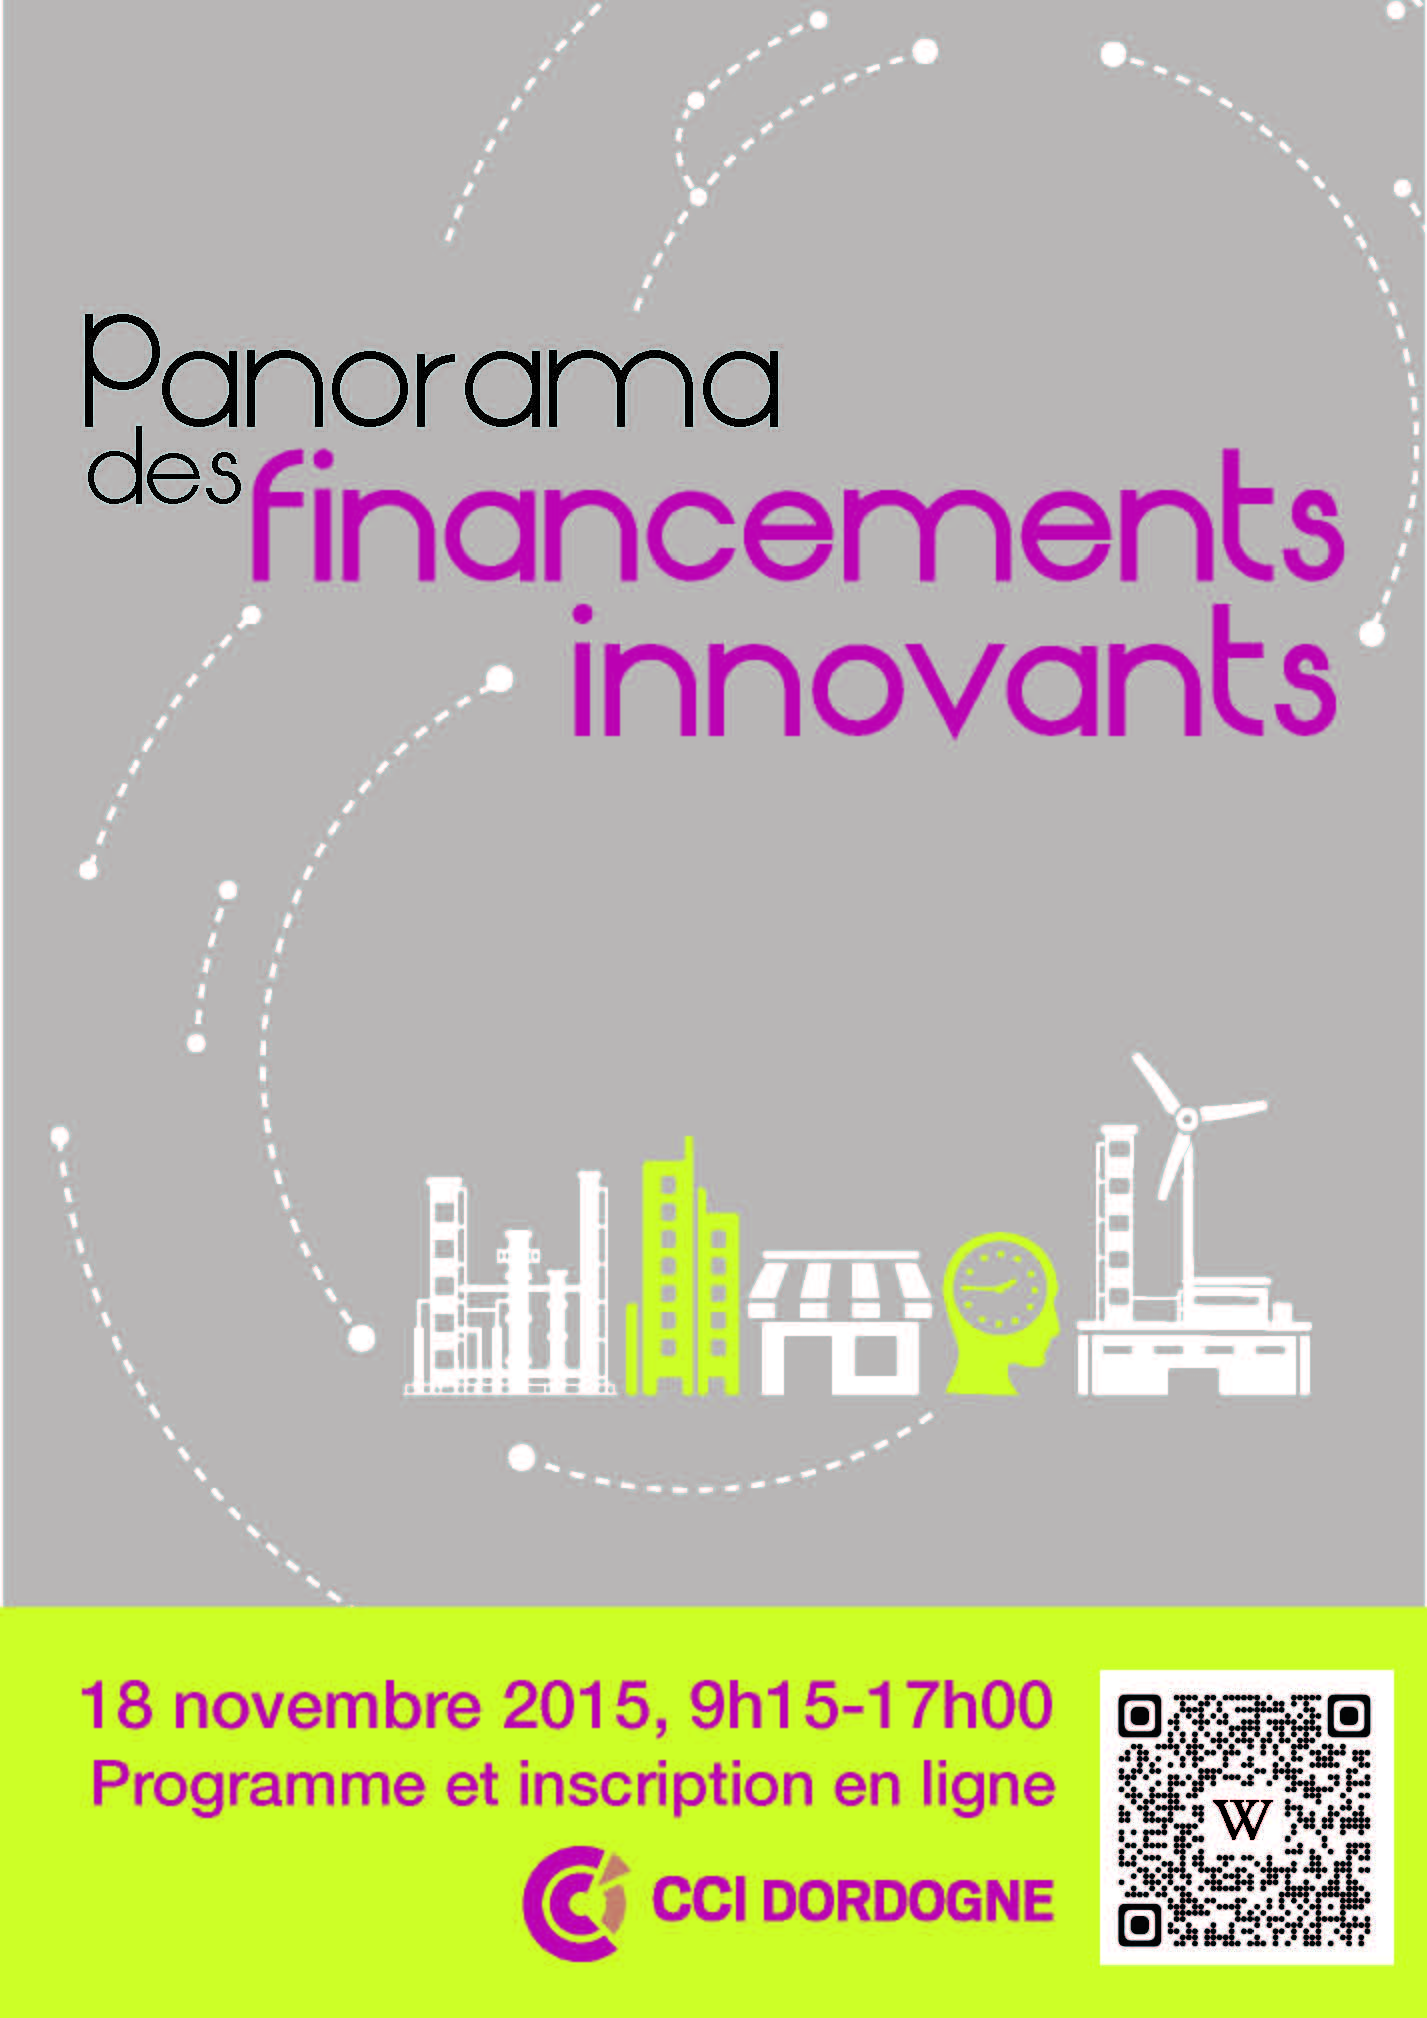 Panorama financements innovants